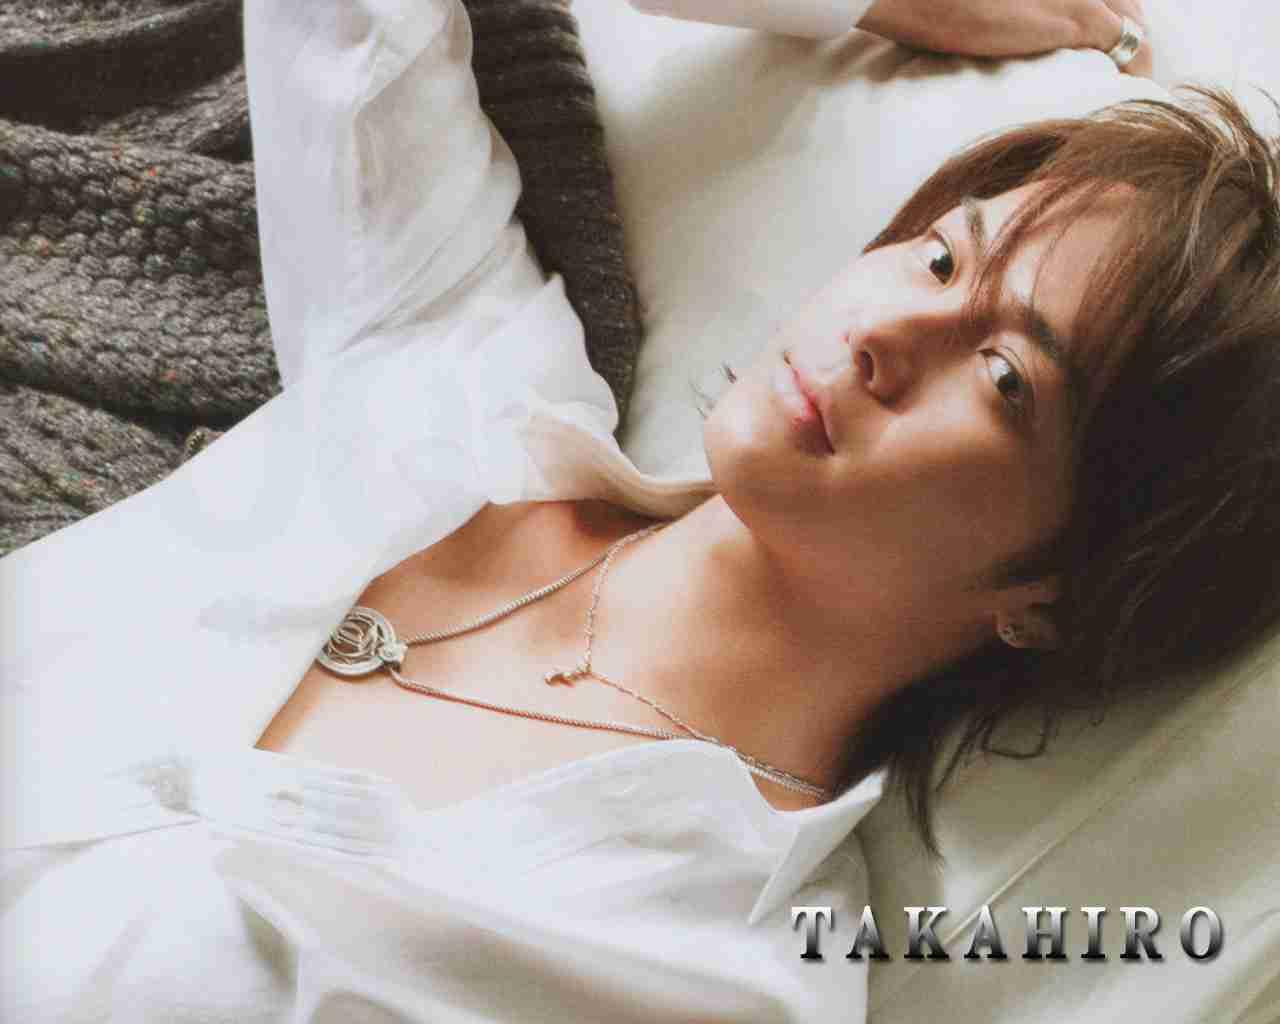 EXILE・TAKAHIRO 俳優デビュー「将来は役者も大きな柱」